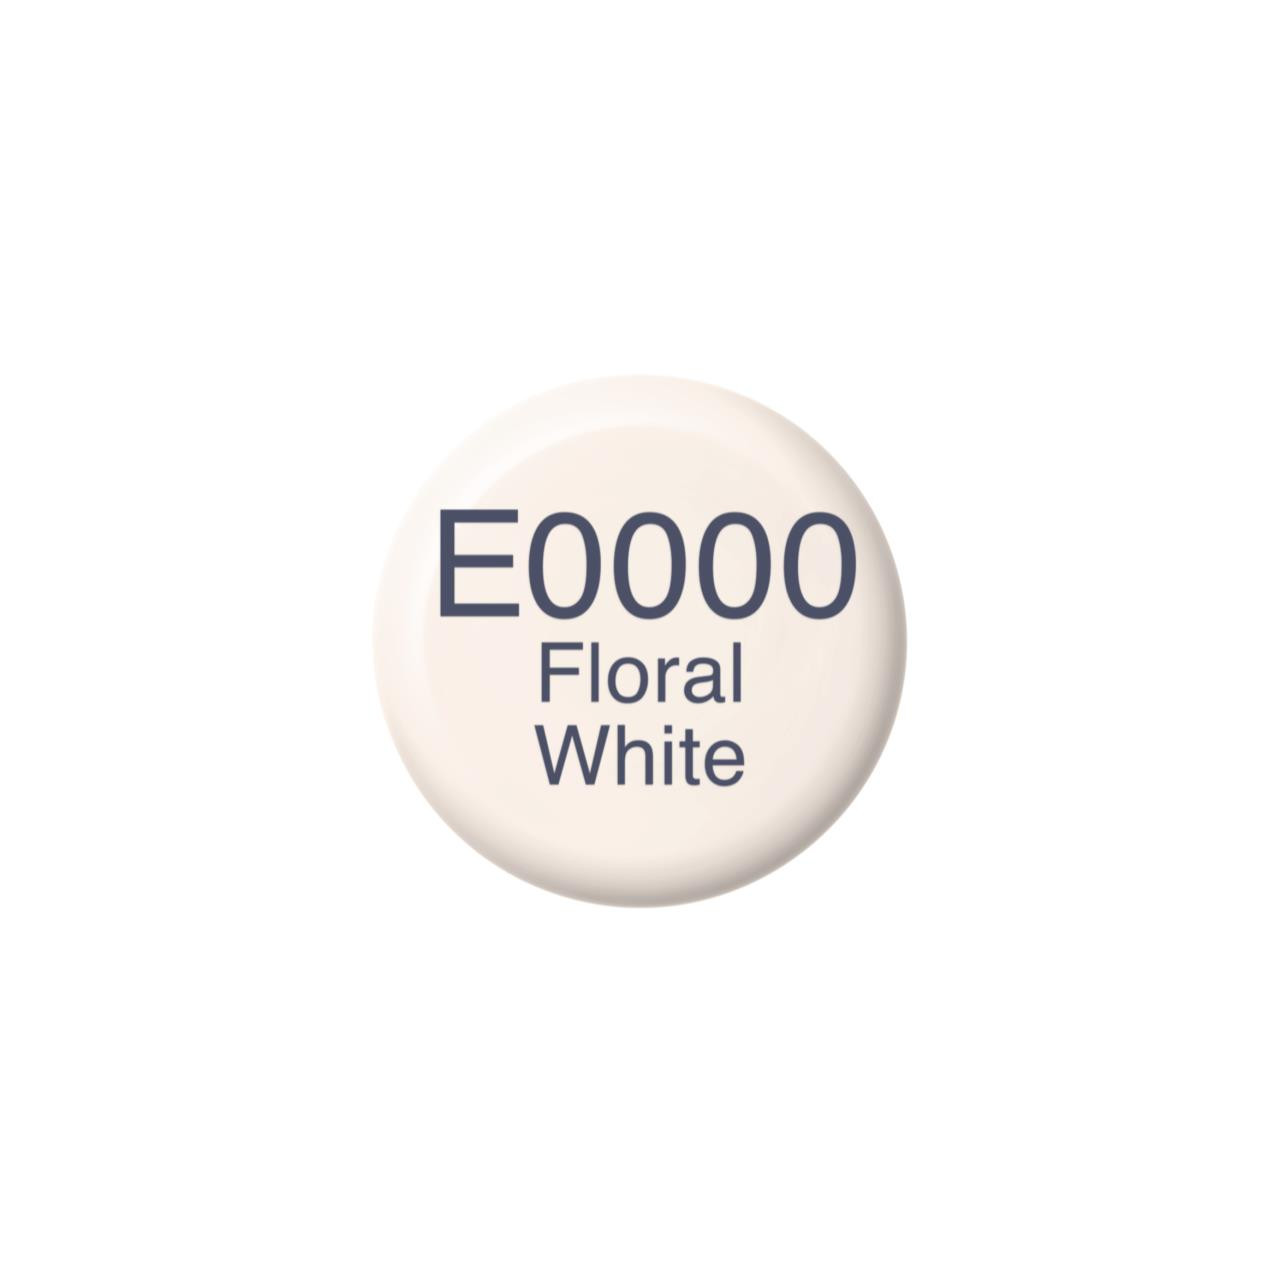 E0000 Floral White, Copic Ink - 4511338056585